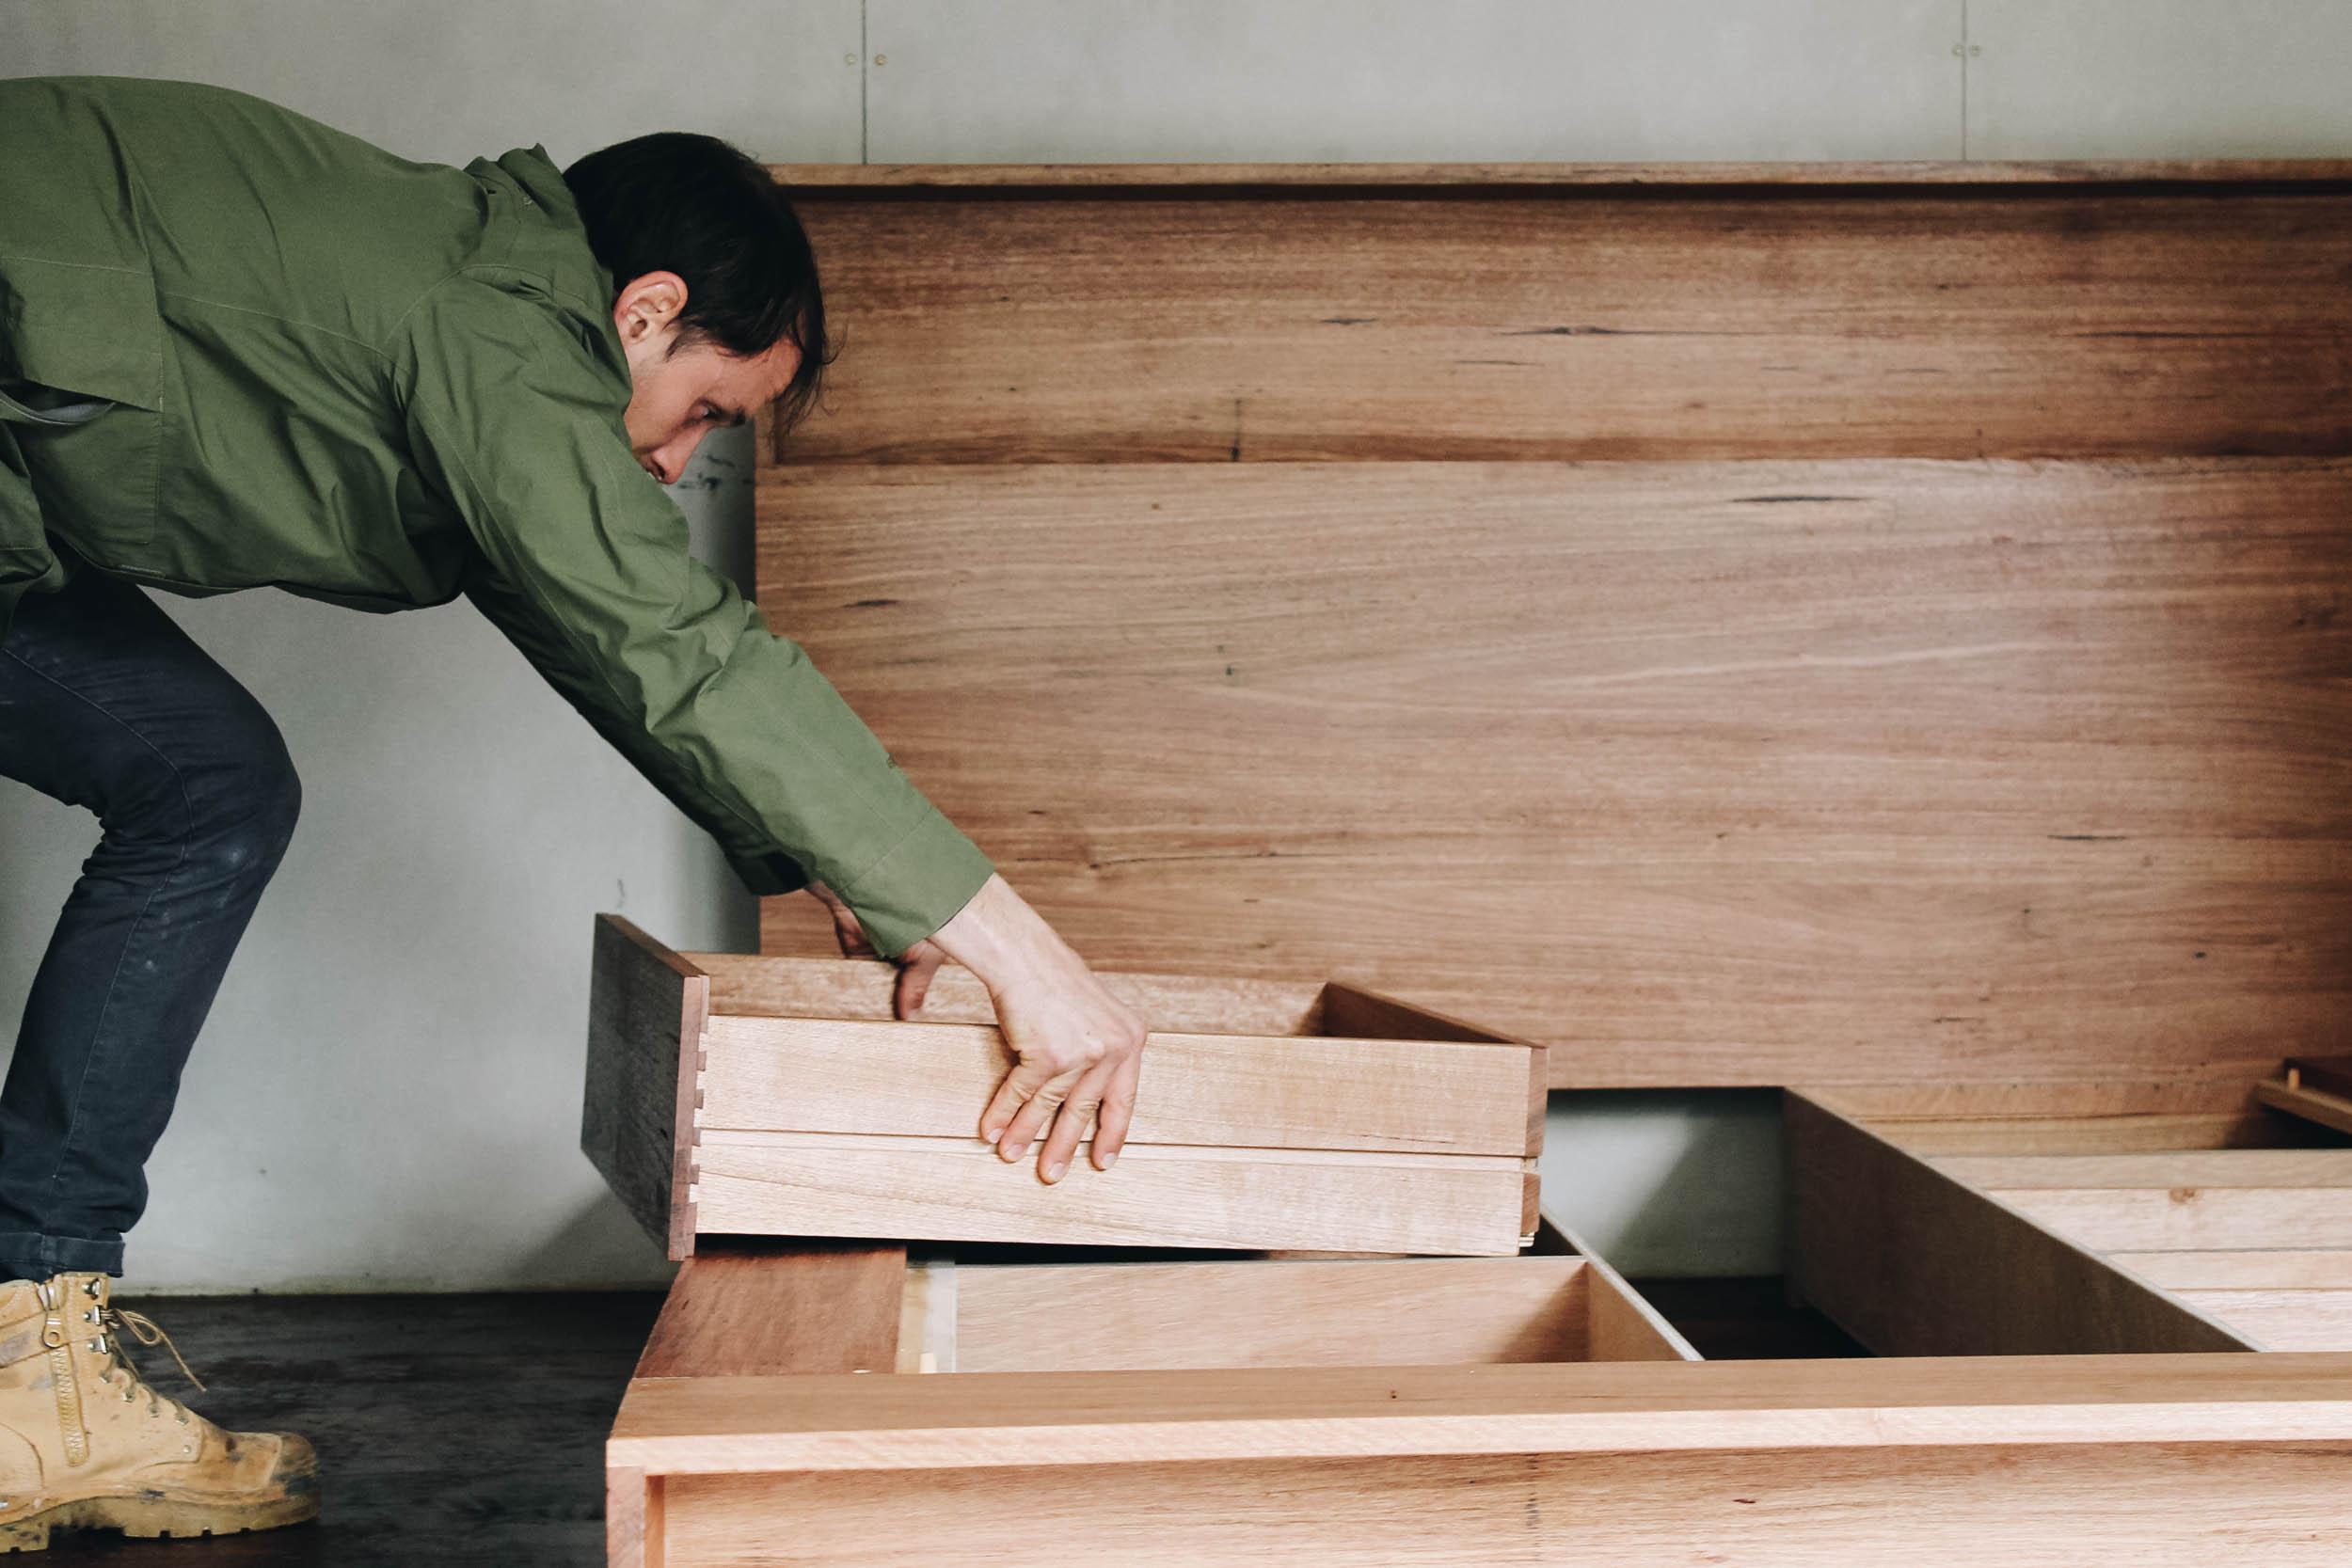 Al and Imo Handmade Bookshelf Drawer Bed Recycled timber - surf coast - melbourne - australia-38.jpg